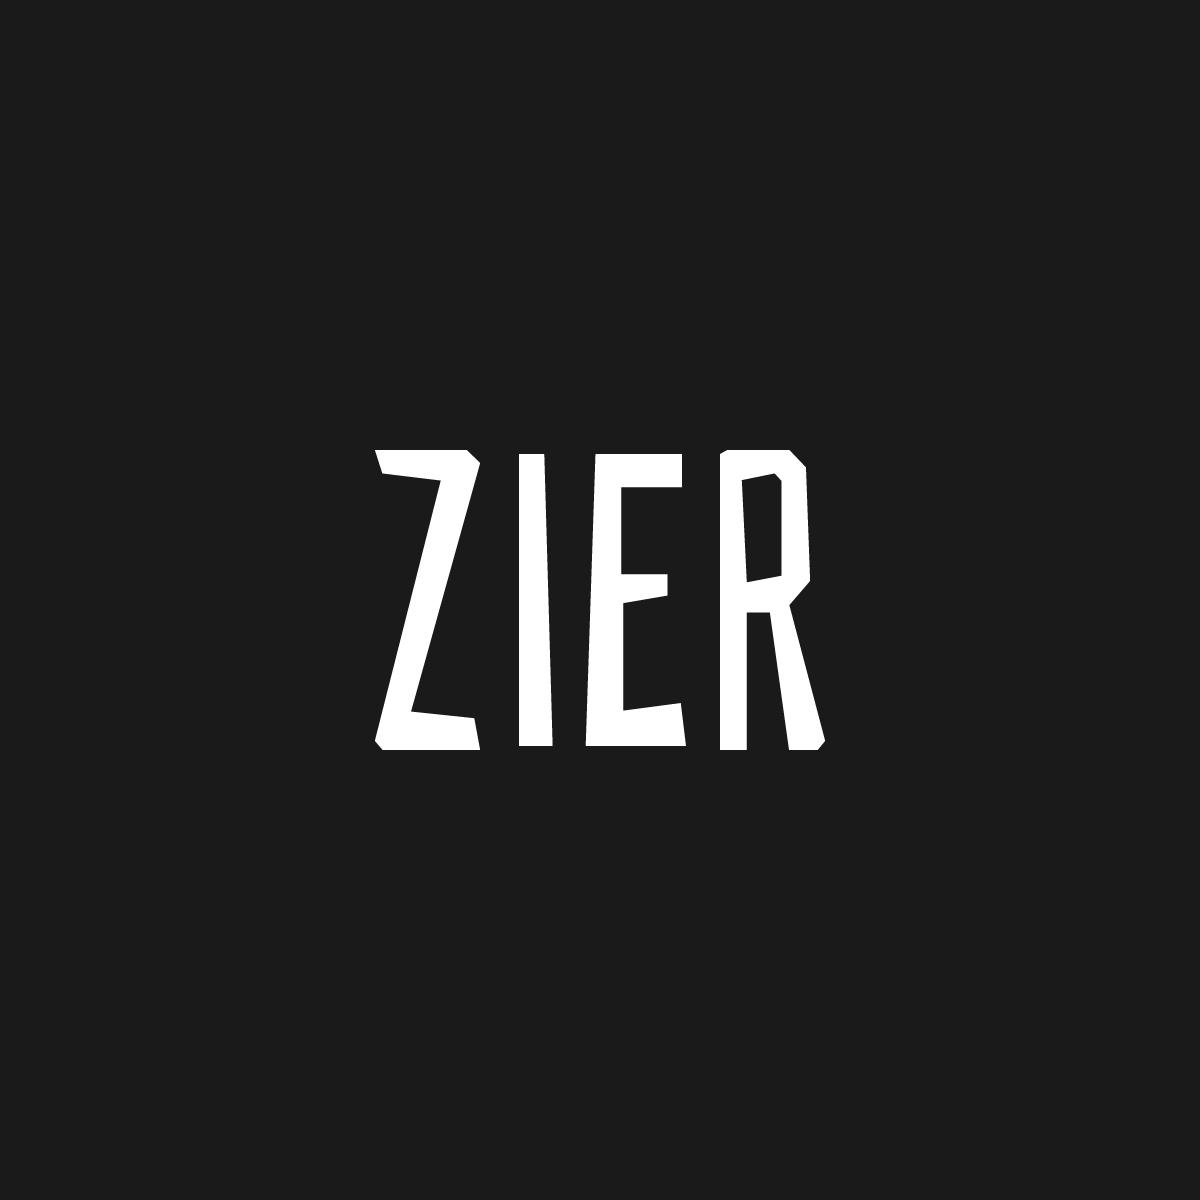 ZIER GAMES | SPLOOSH MEDIA | BRANDING AGENCY MANCHESTER